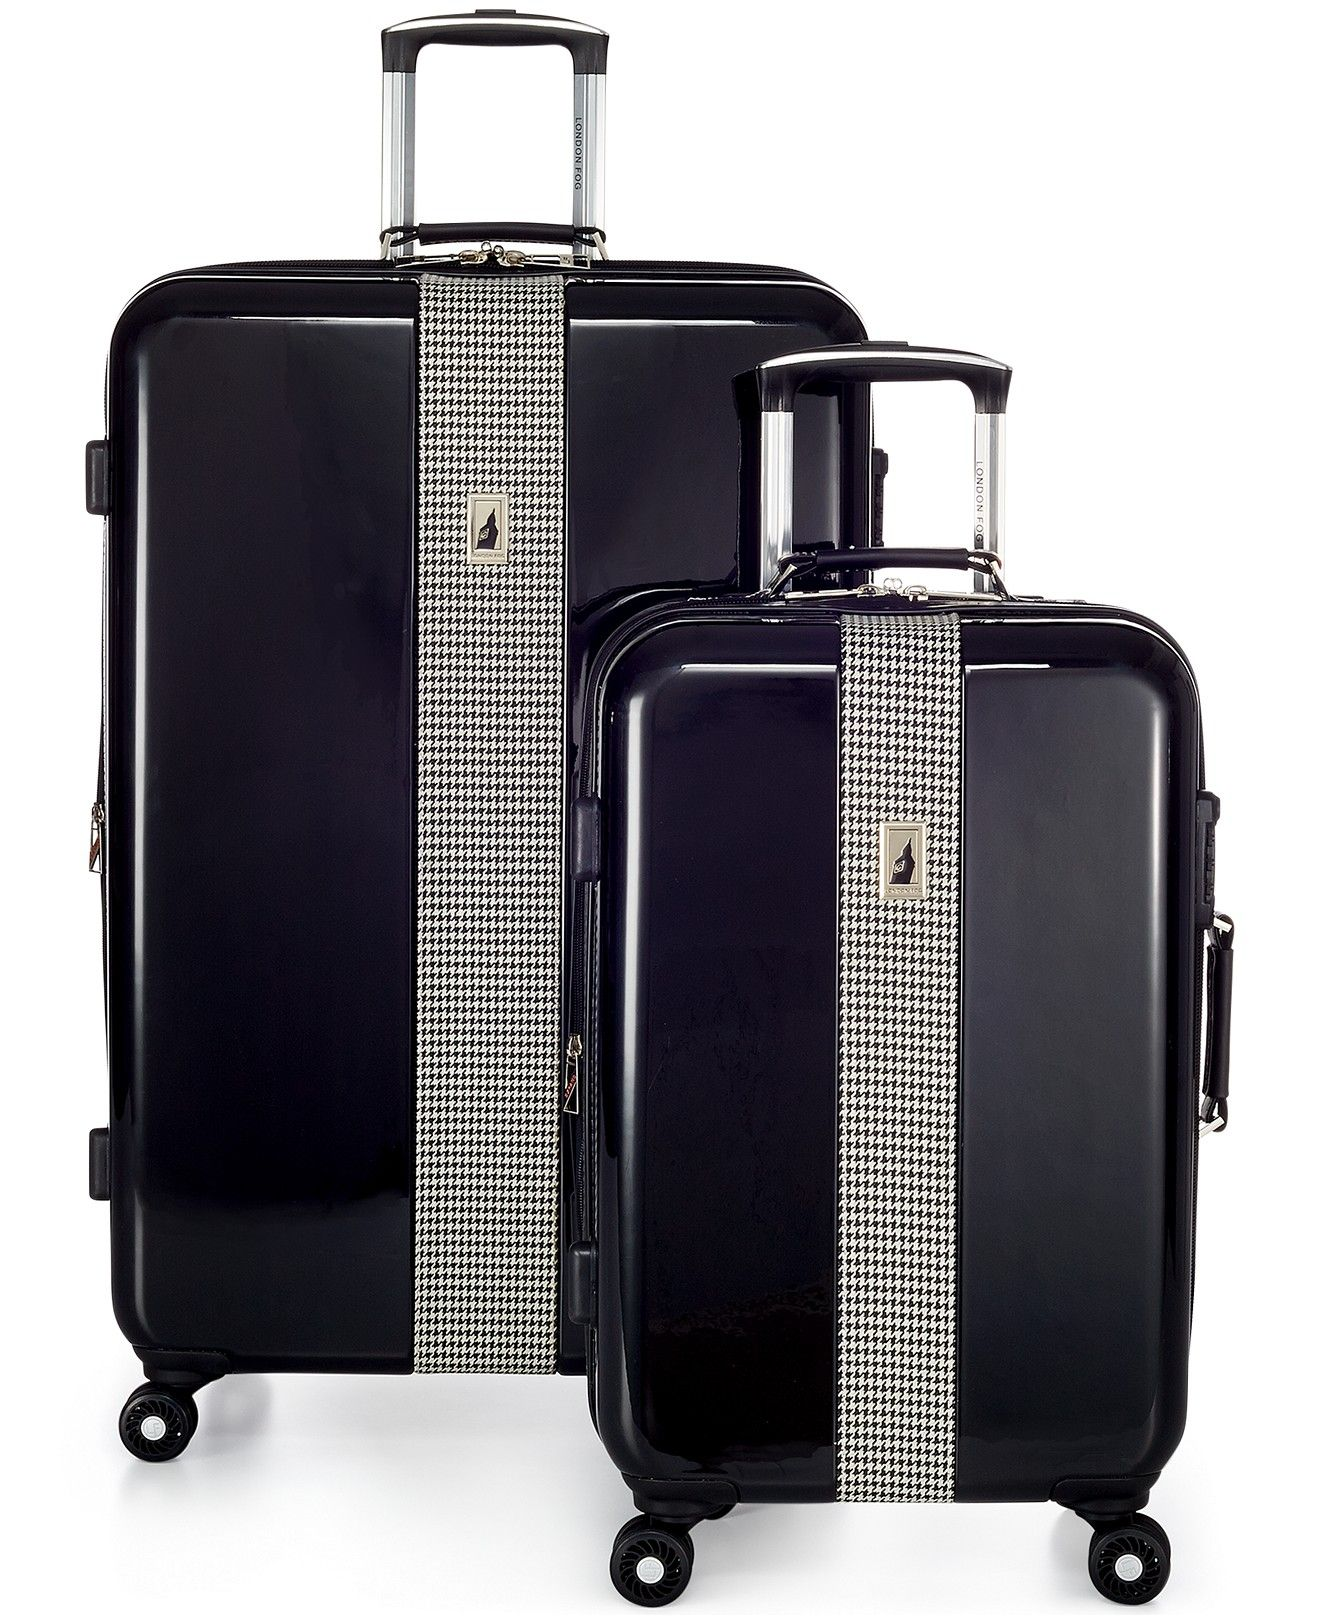 London Fog Carry-On Luggage // New & Popular 2017 - YouTube